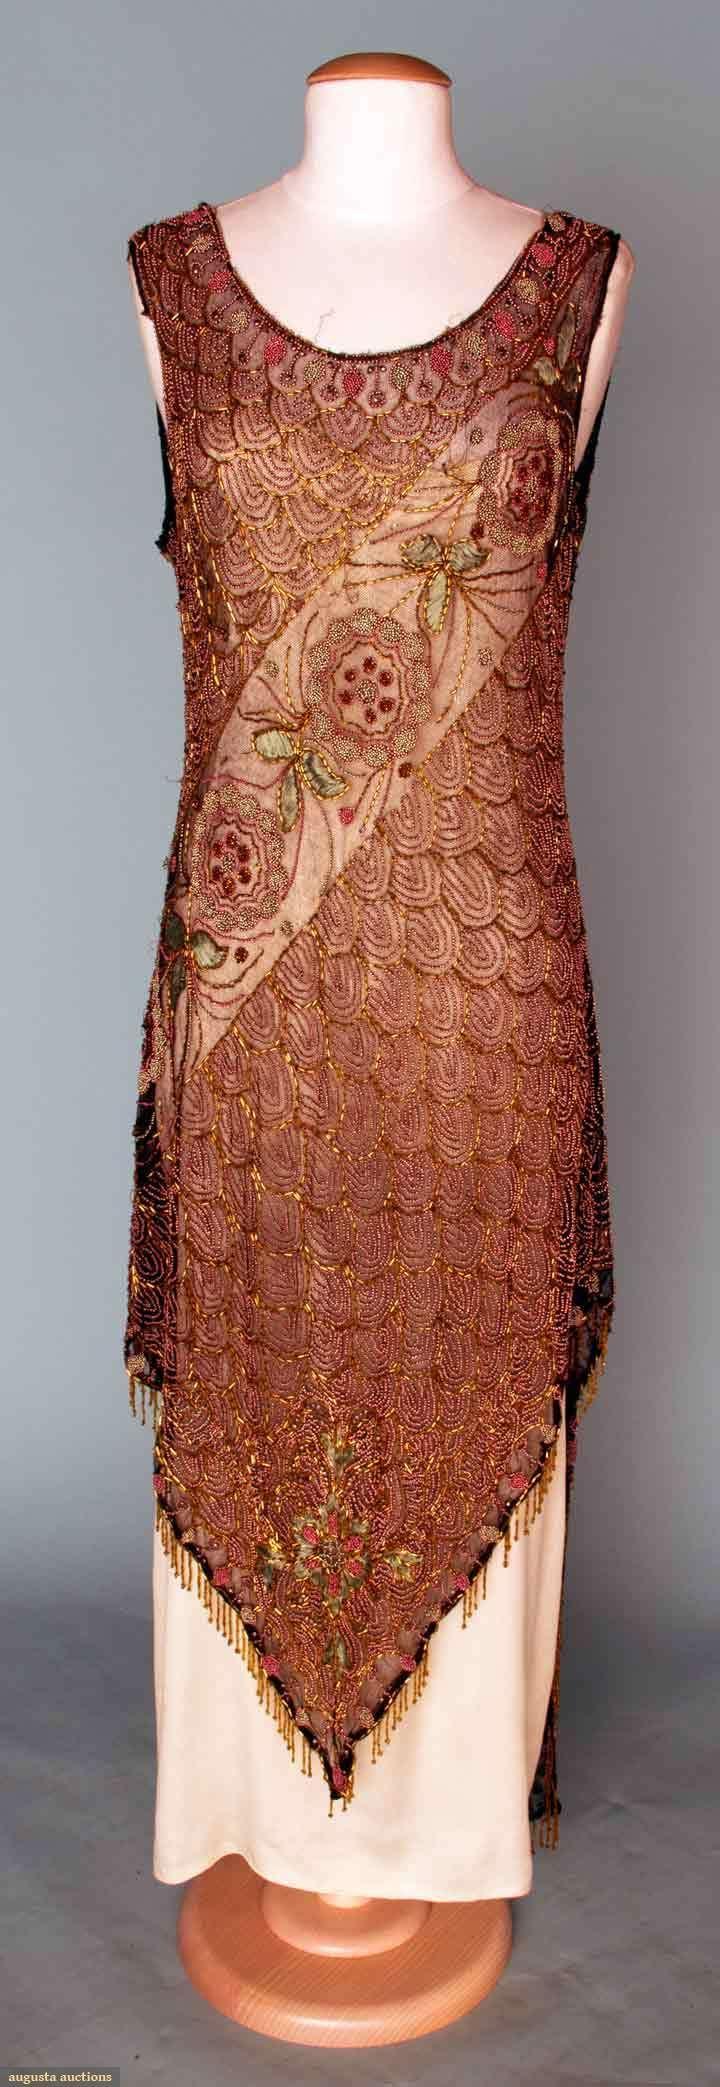 1920's art deco style dress.